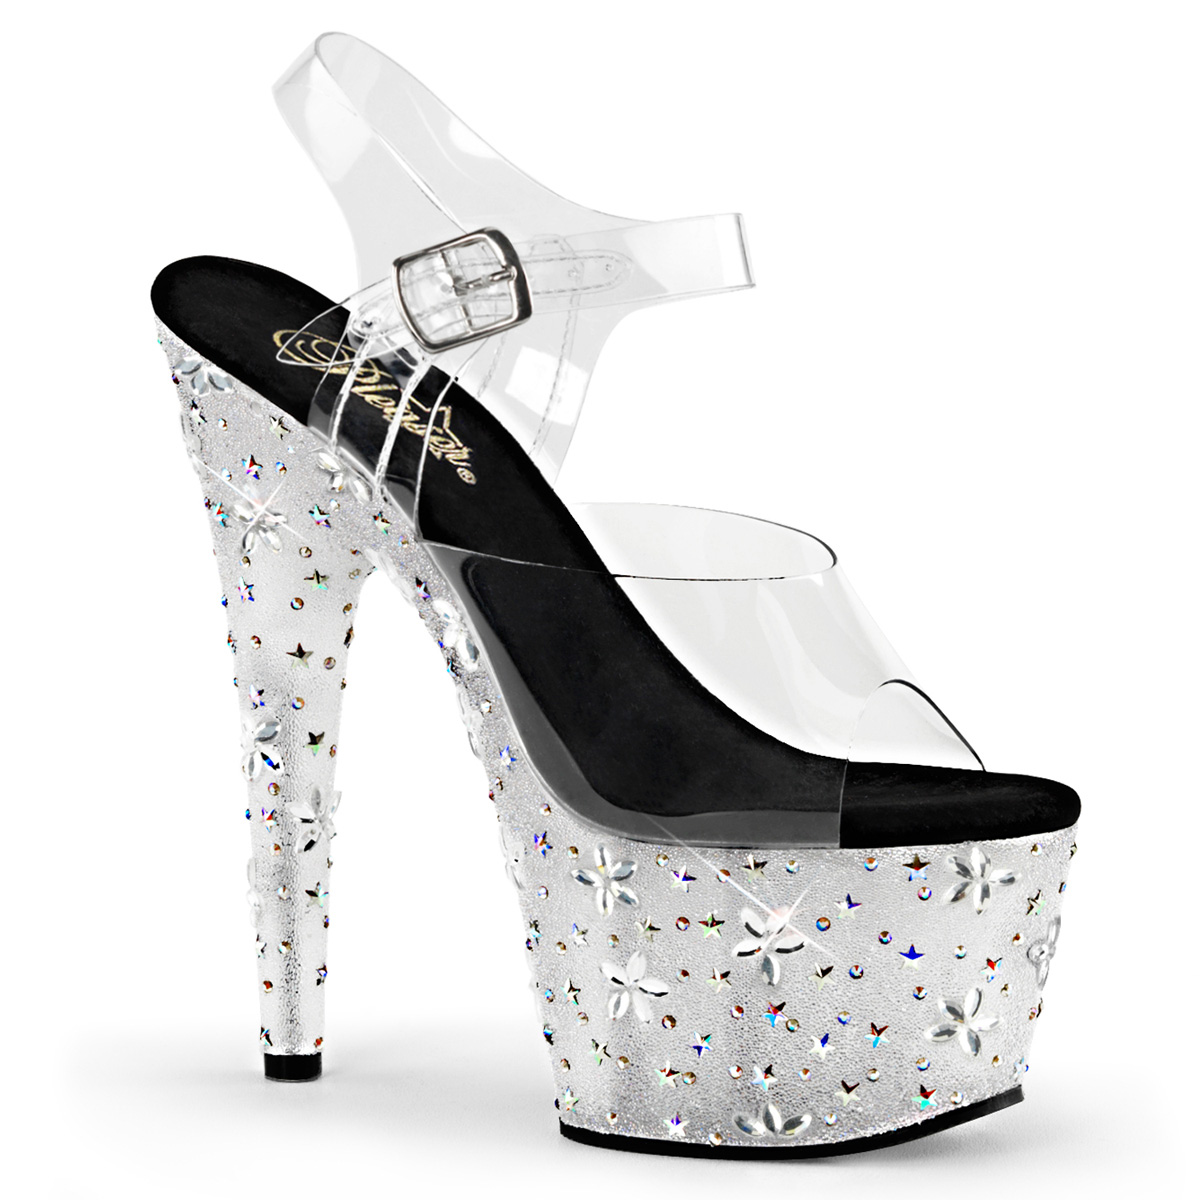 Pleaser Womens Pf Ankle Strap Sandal W/Rs & Flower Design